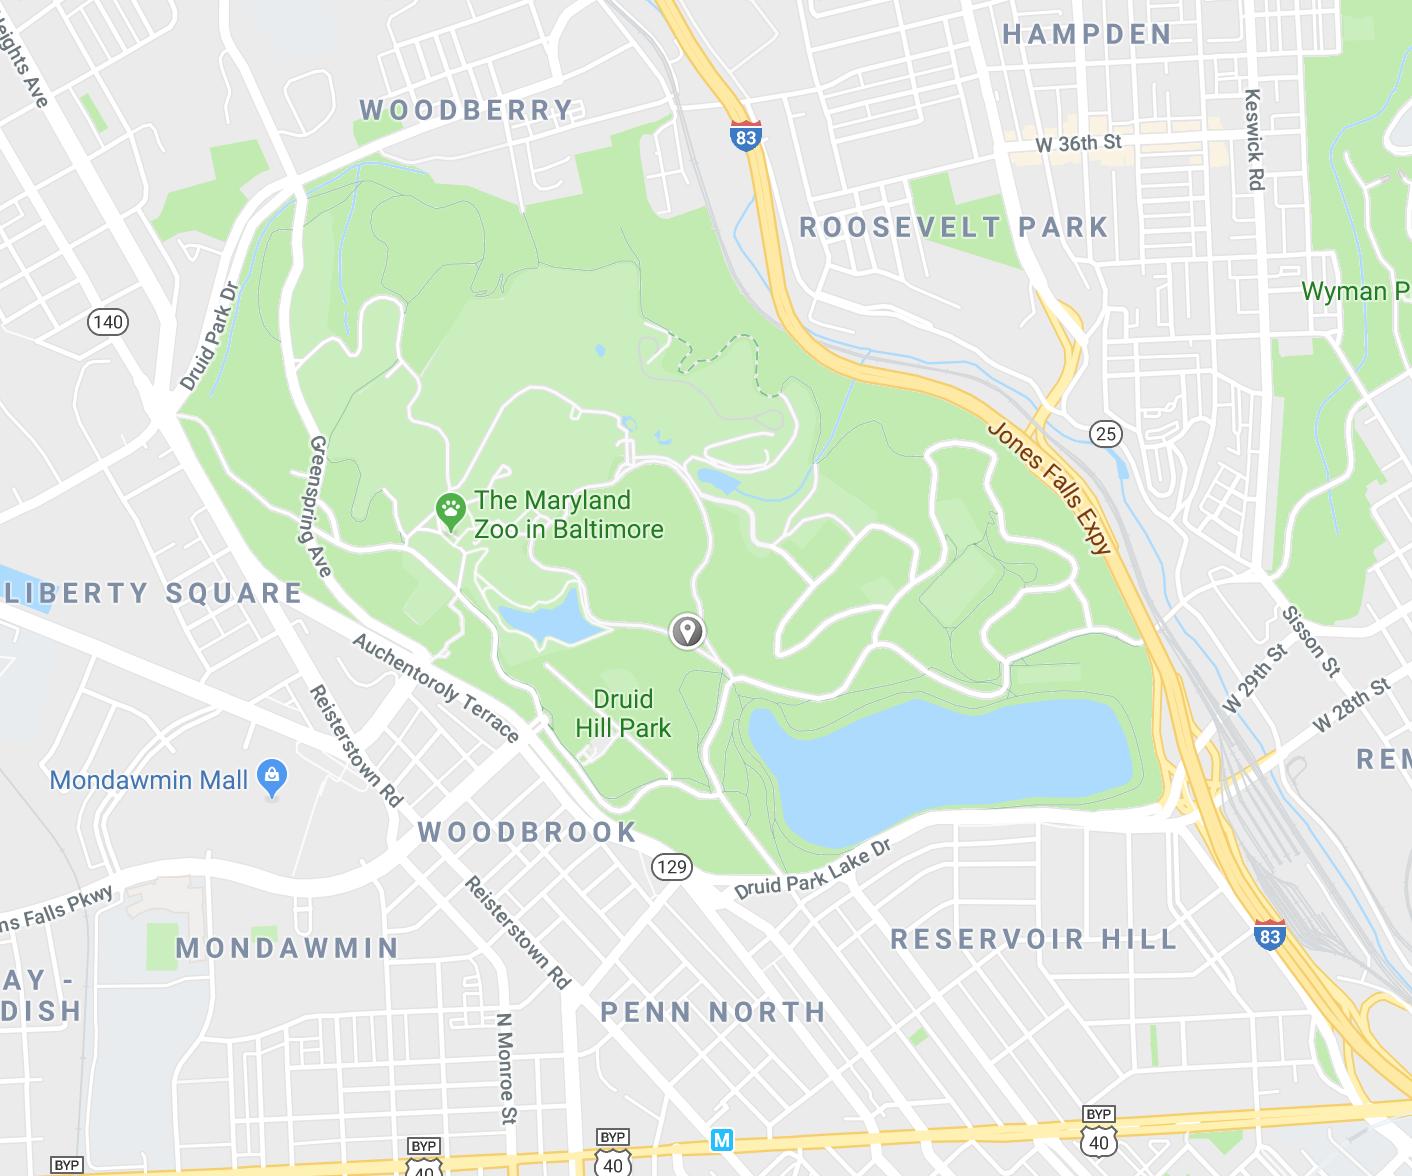 You can plugin: Hanlon Dr. Baltimore, MD 21211 into Google Maps